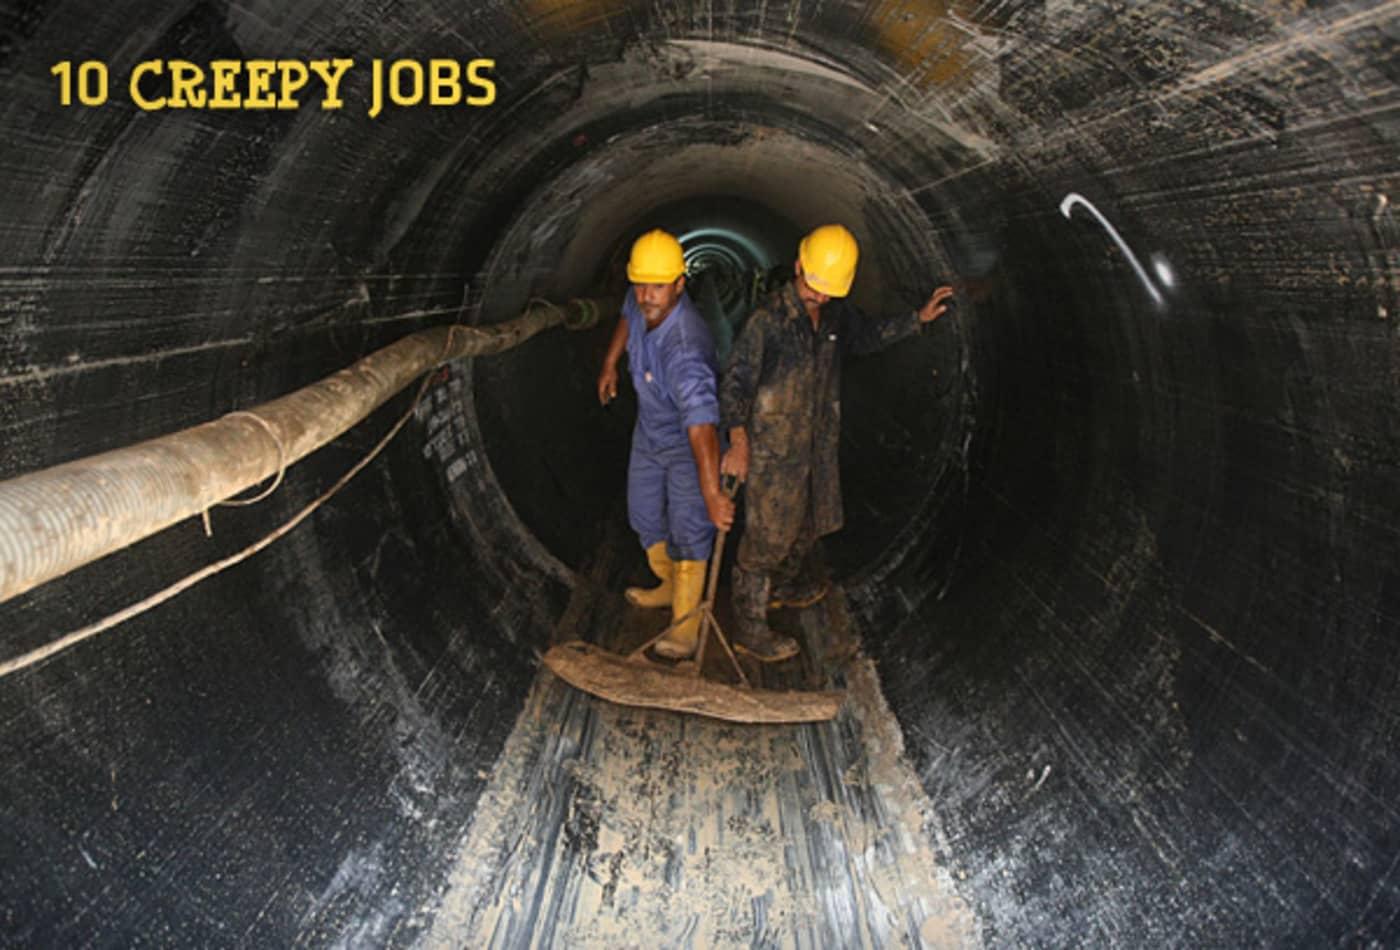 10 Creepy Jobs